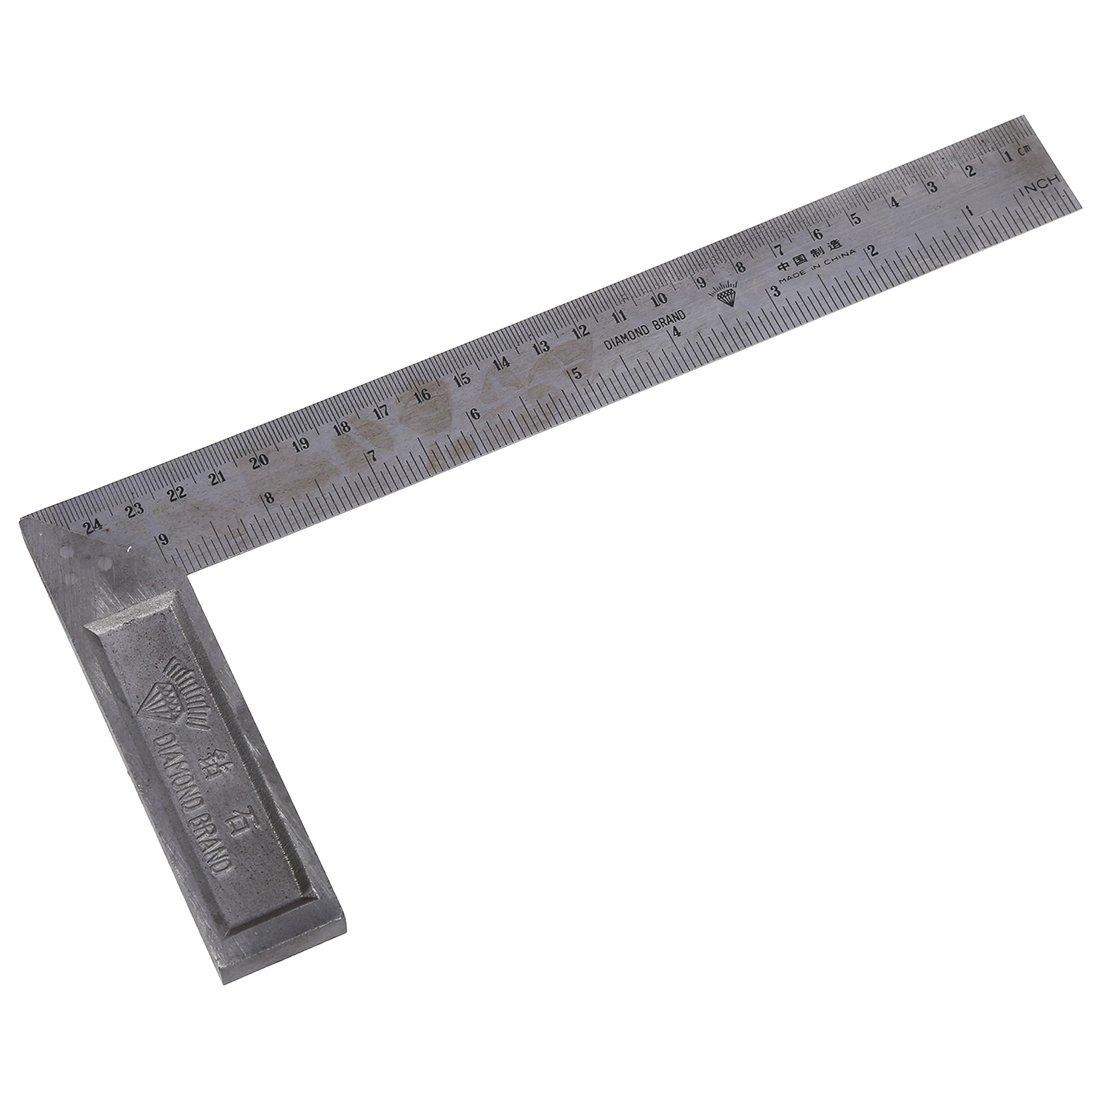 R L-rechter Winkel Lineal 90 Grad 25cm Laenge Edelstahl L-rechter Winkel Lineal SODIAL